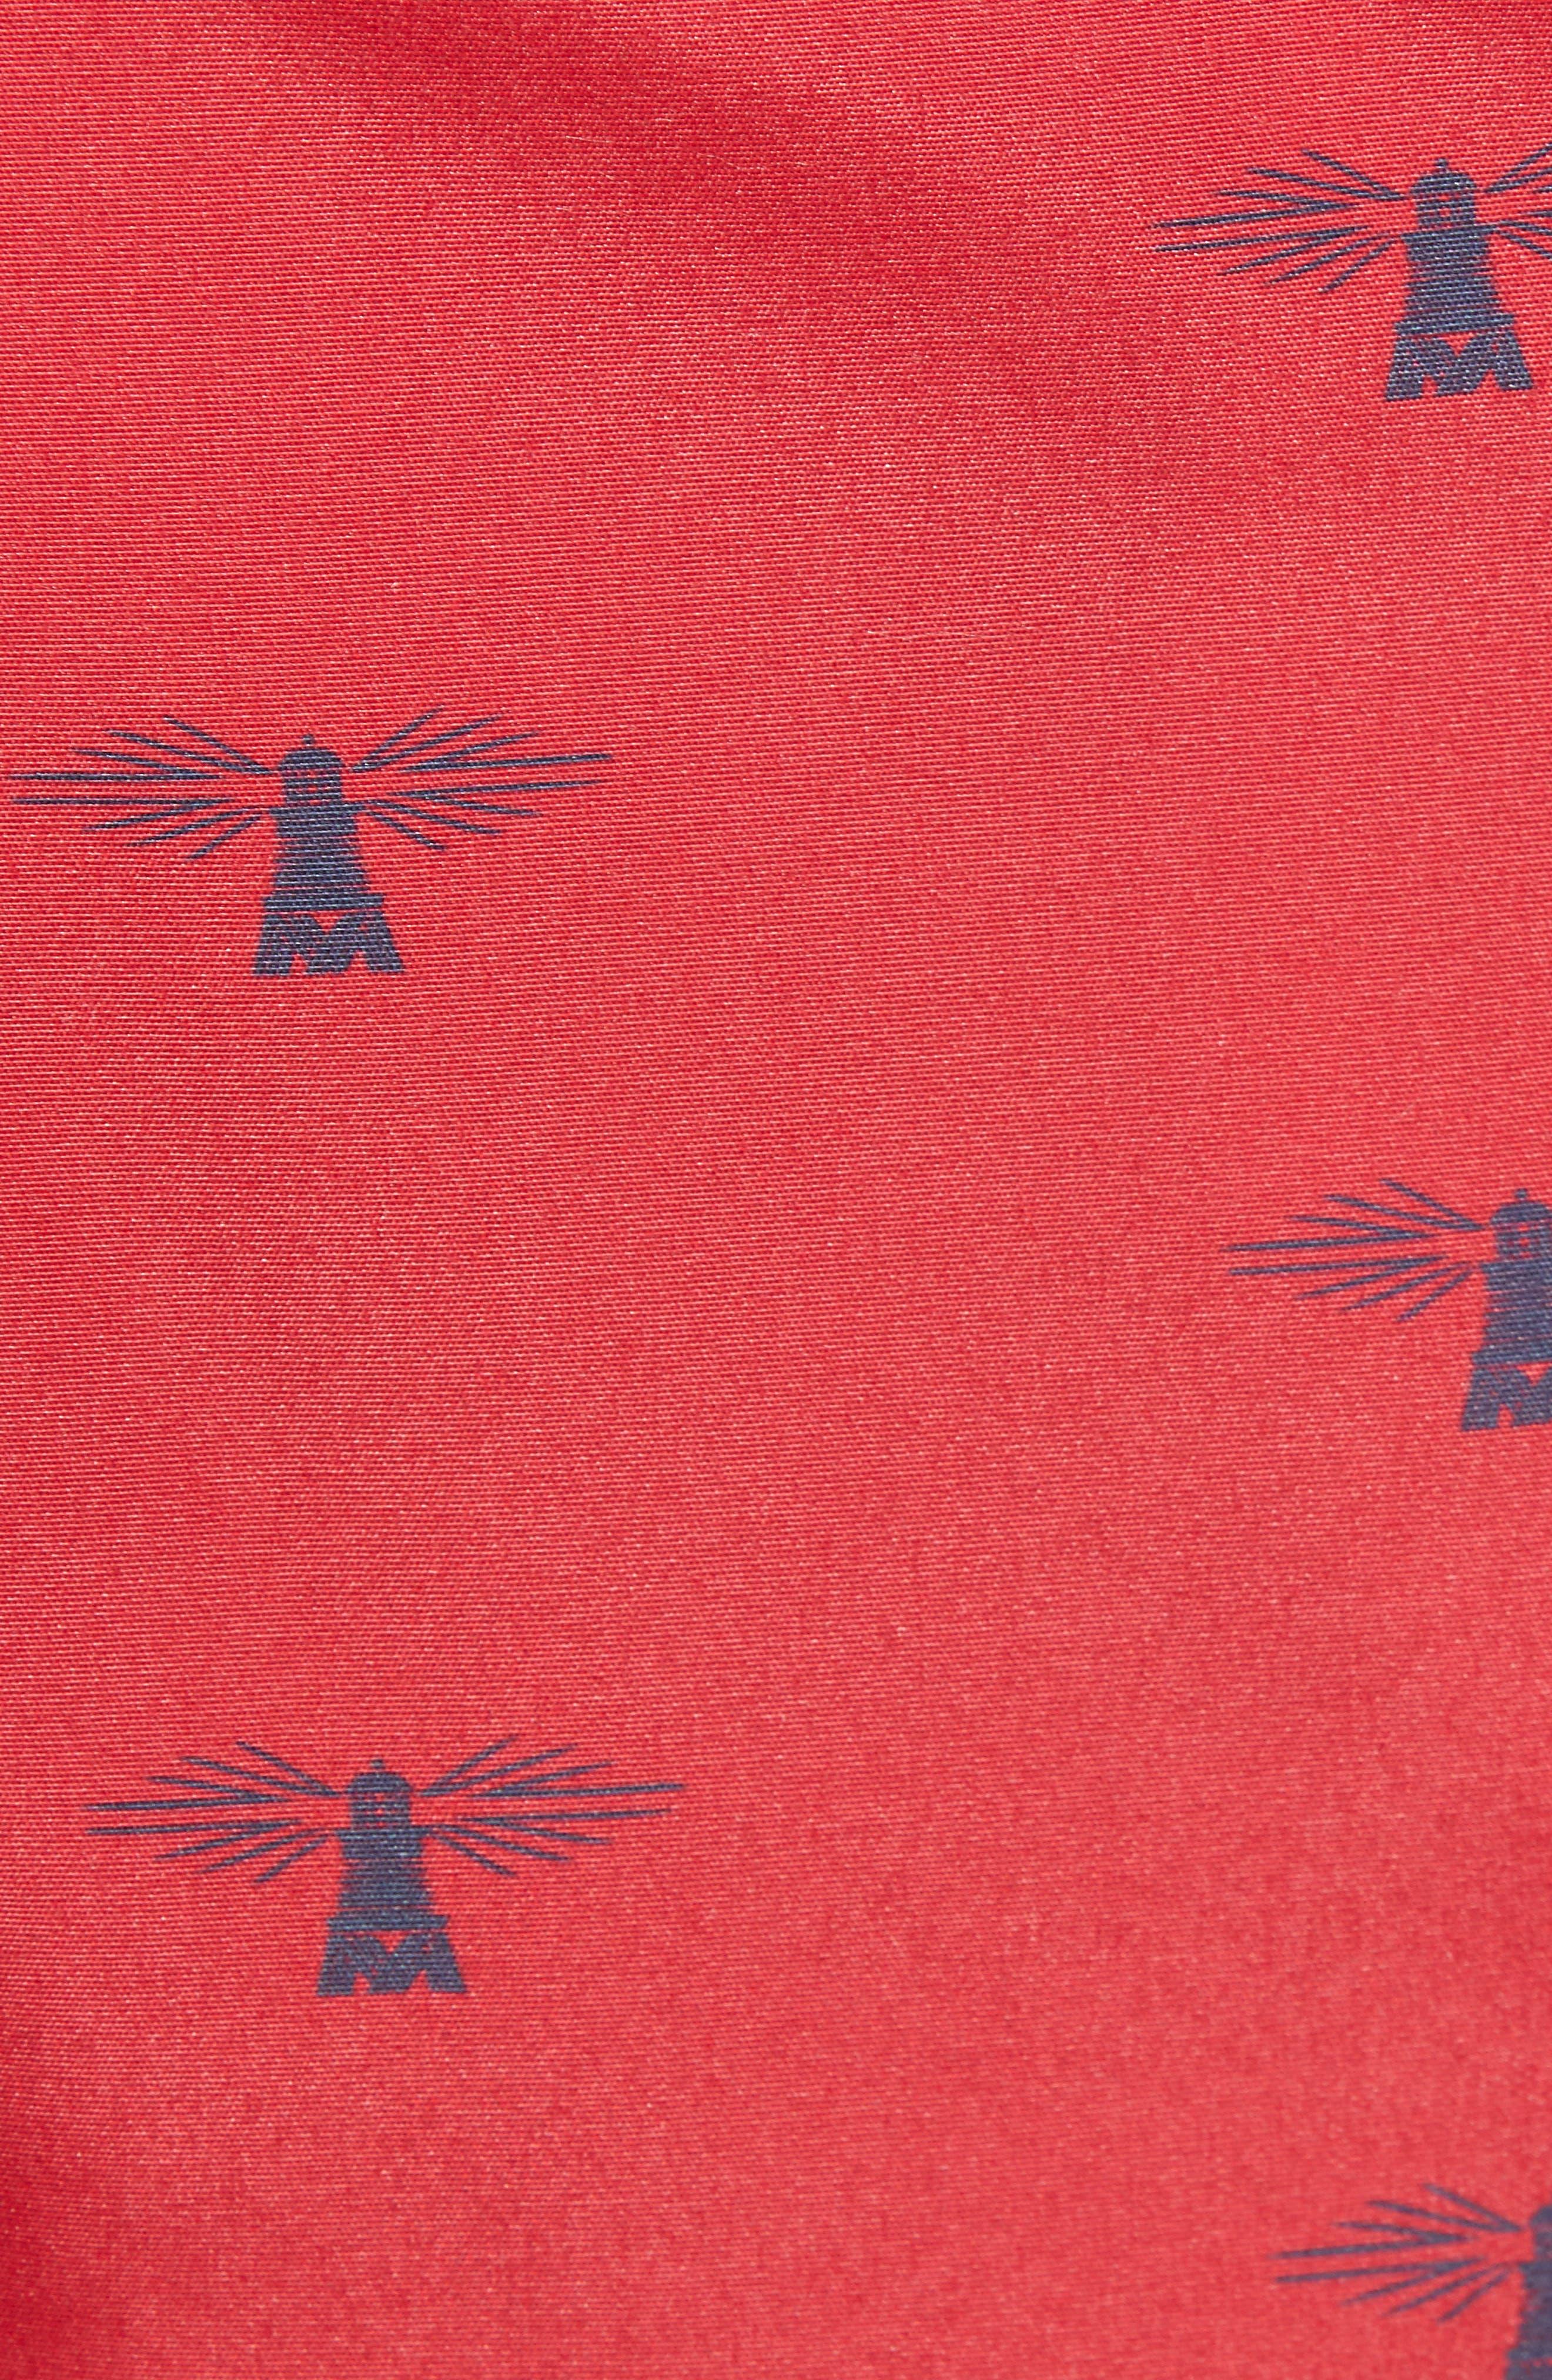 BARBOUR, Coastal Print Swim Trunks, Alternate thumbnail 5, color, RICH RED